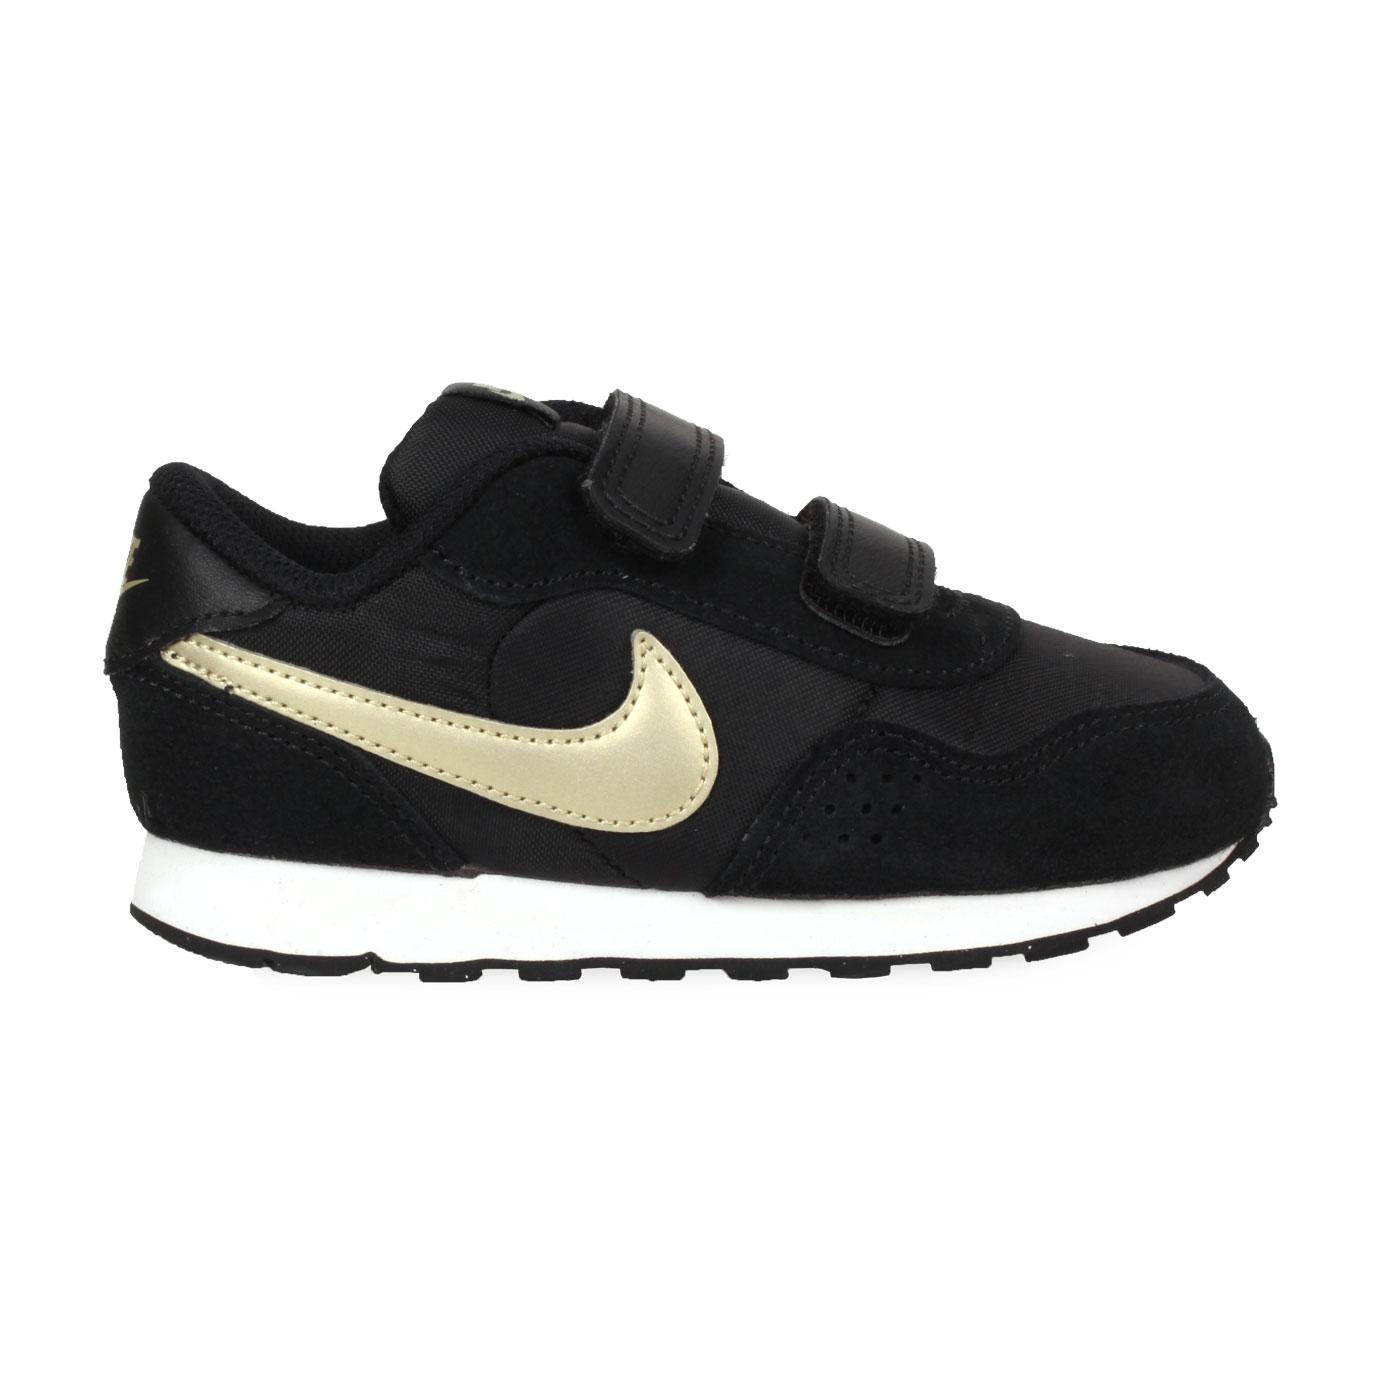 NIKE 小童運動慢跑鞋  @MD VALIANT (TDV)@CN8560009